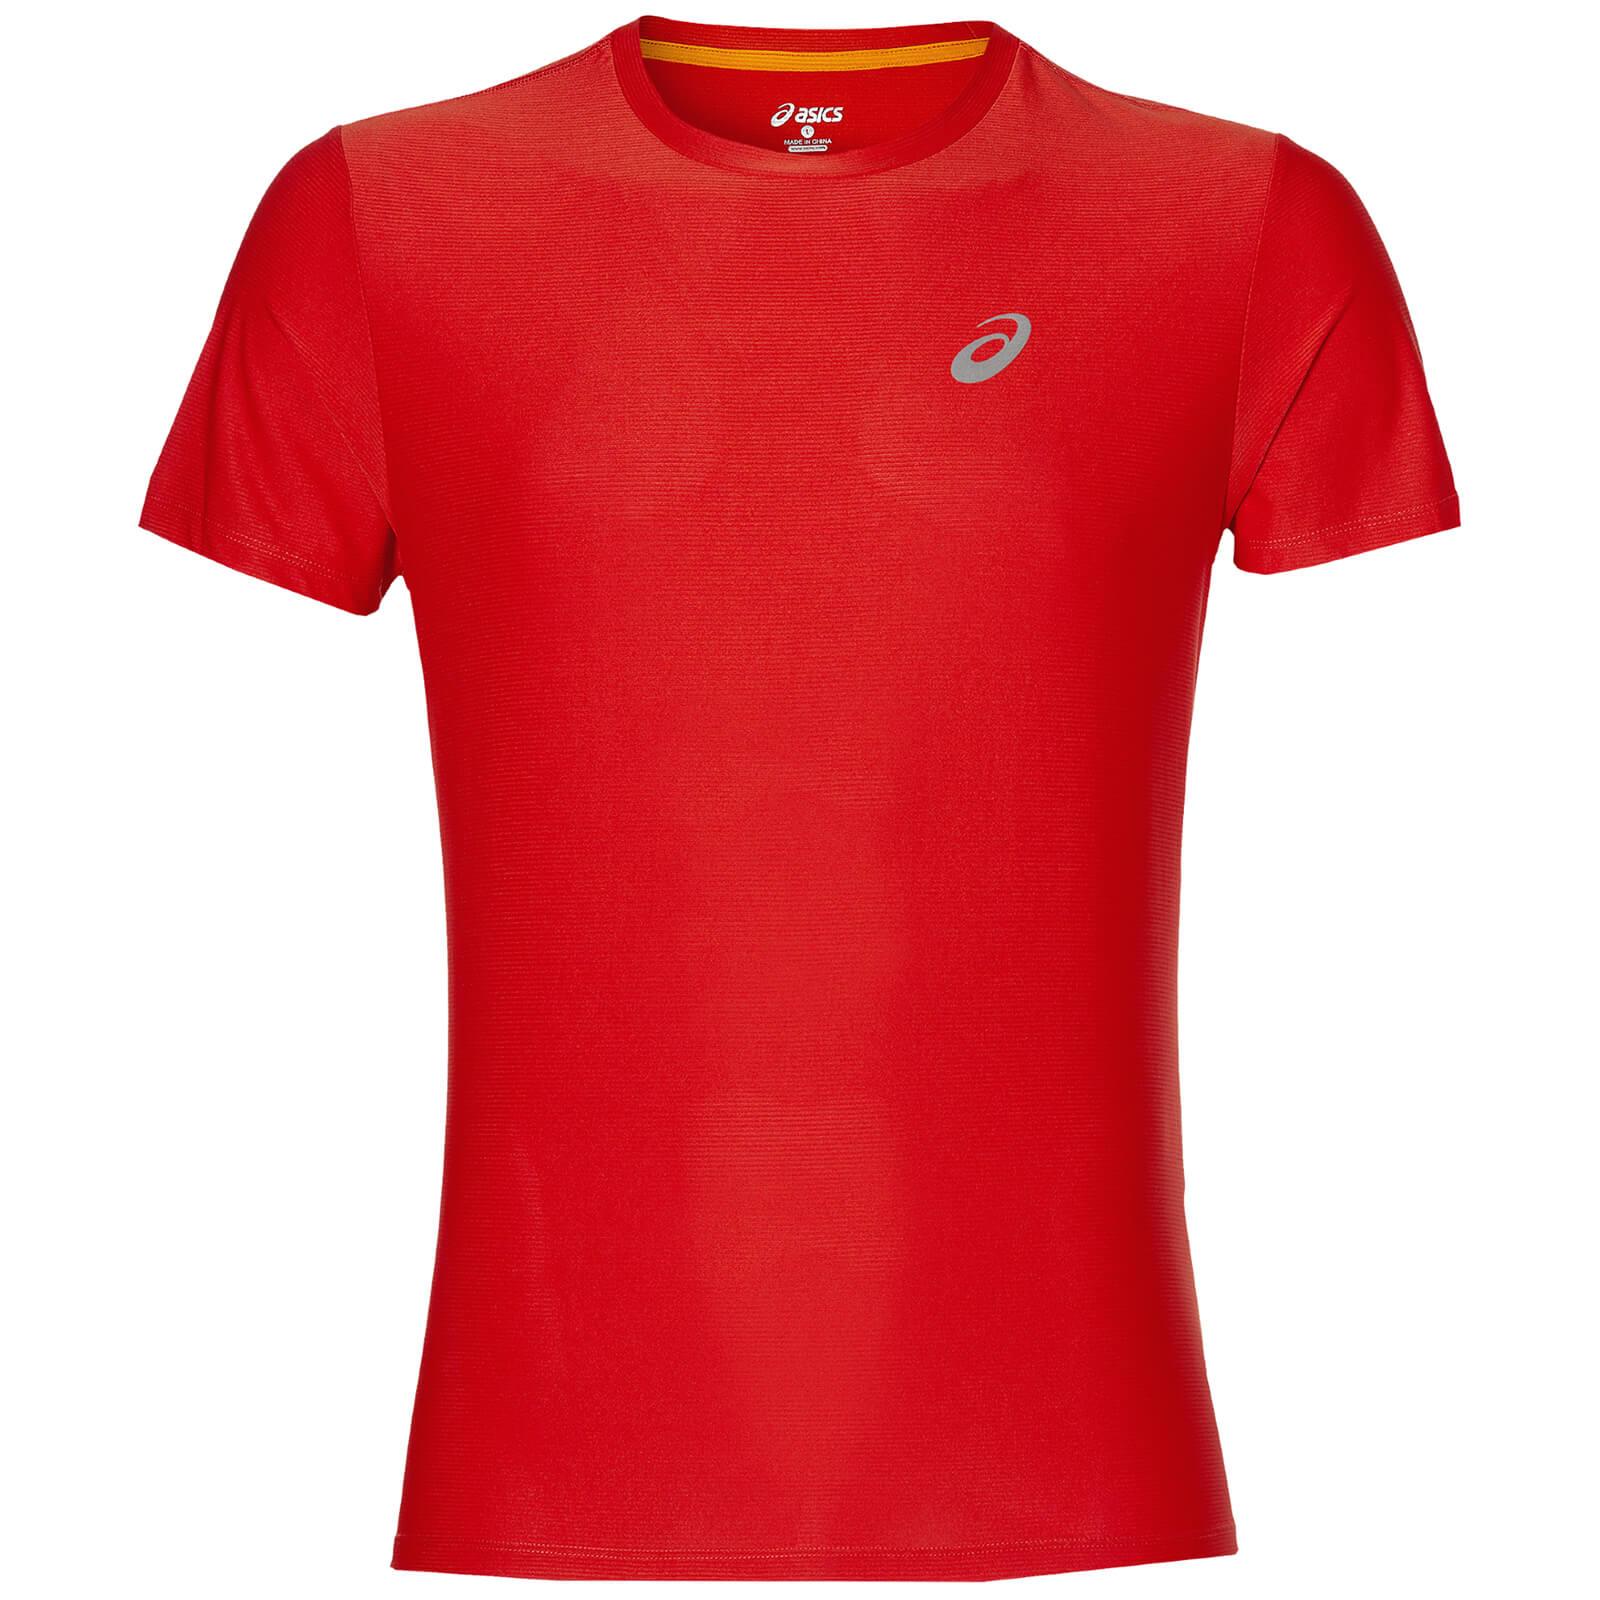 asics mens running shirt